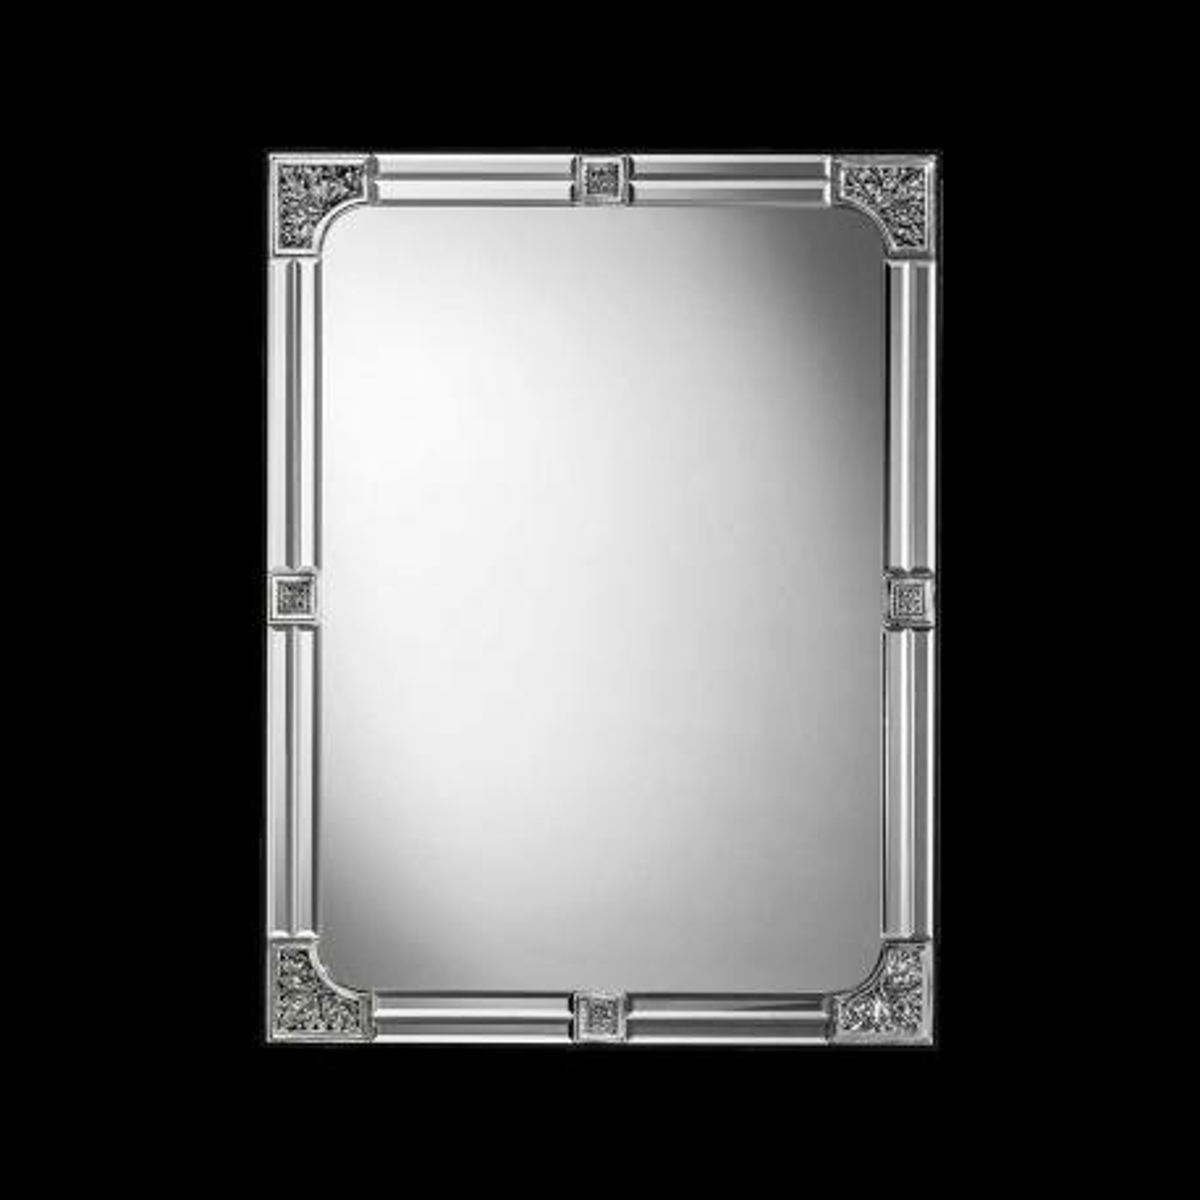 """Tecla "" Murano glas venezianischen spiegel"